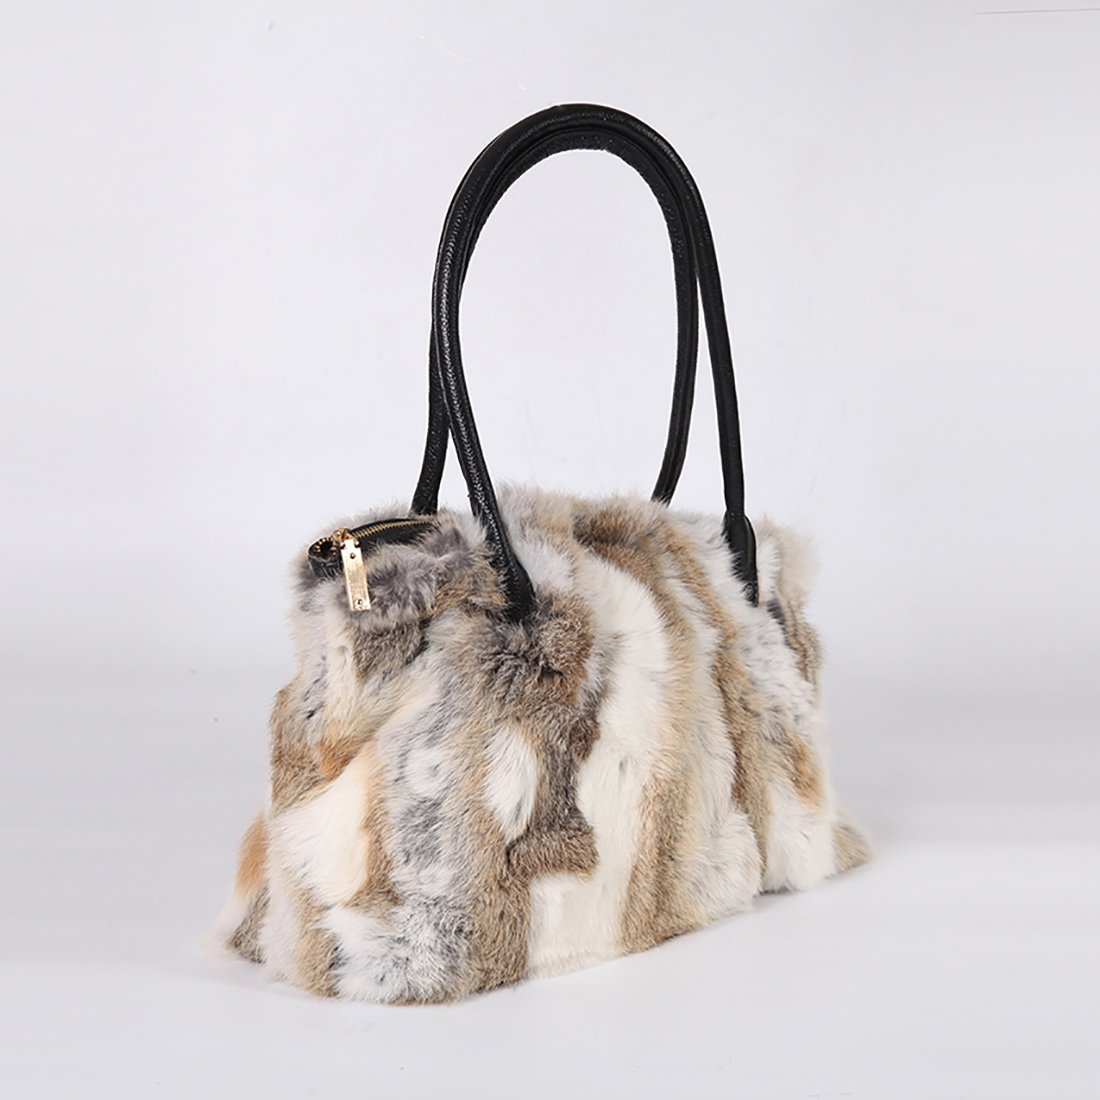 GCID-BAO06-1 URSFUR Winter Shoulder Bag Women Real Rabbit Fur Handbag Wristlet Clutch Purse Shijiazhuang Starway Imp/&Exp Trading Co .Ltd